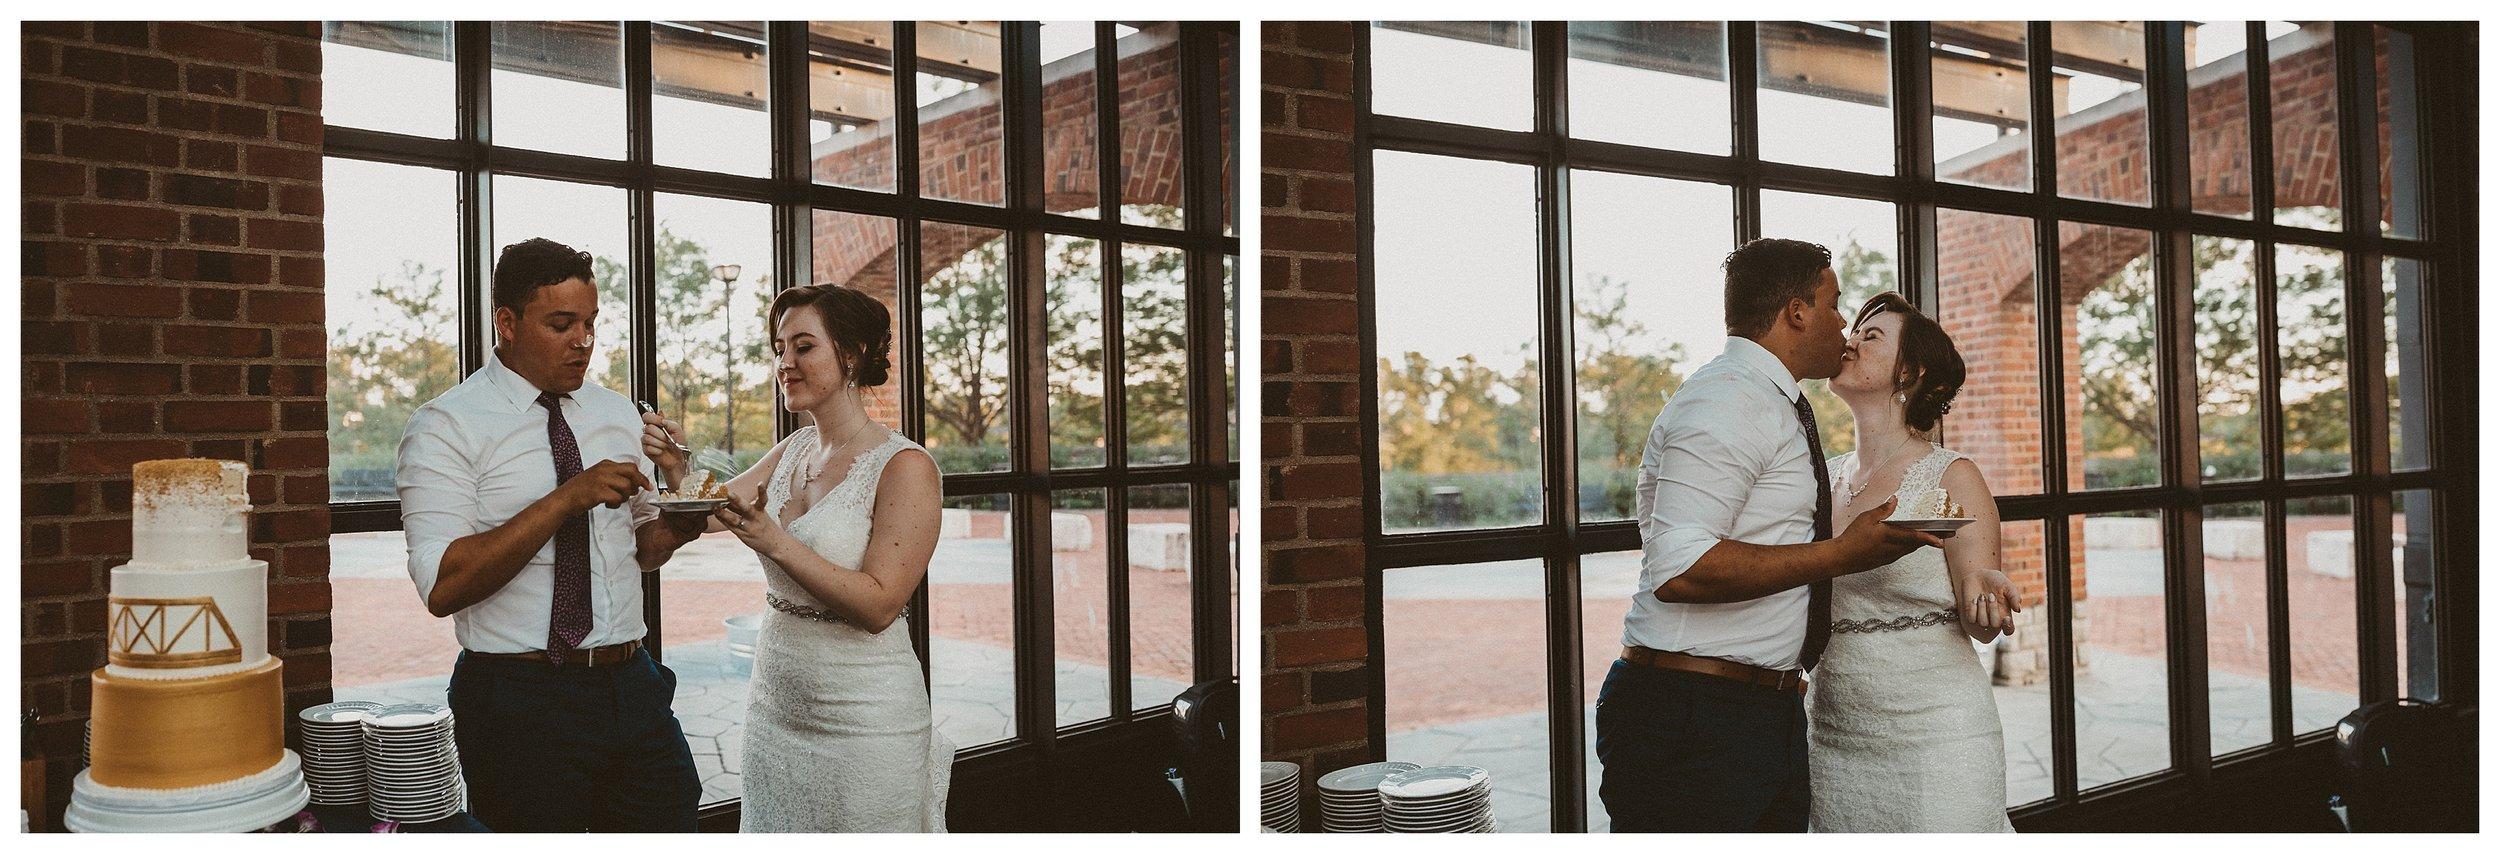 ohdeerphotographymicapeternorthbankwedding_0163.jpg